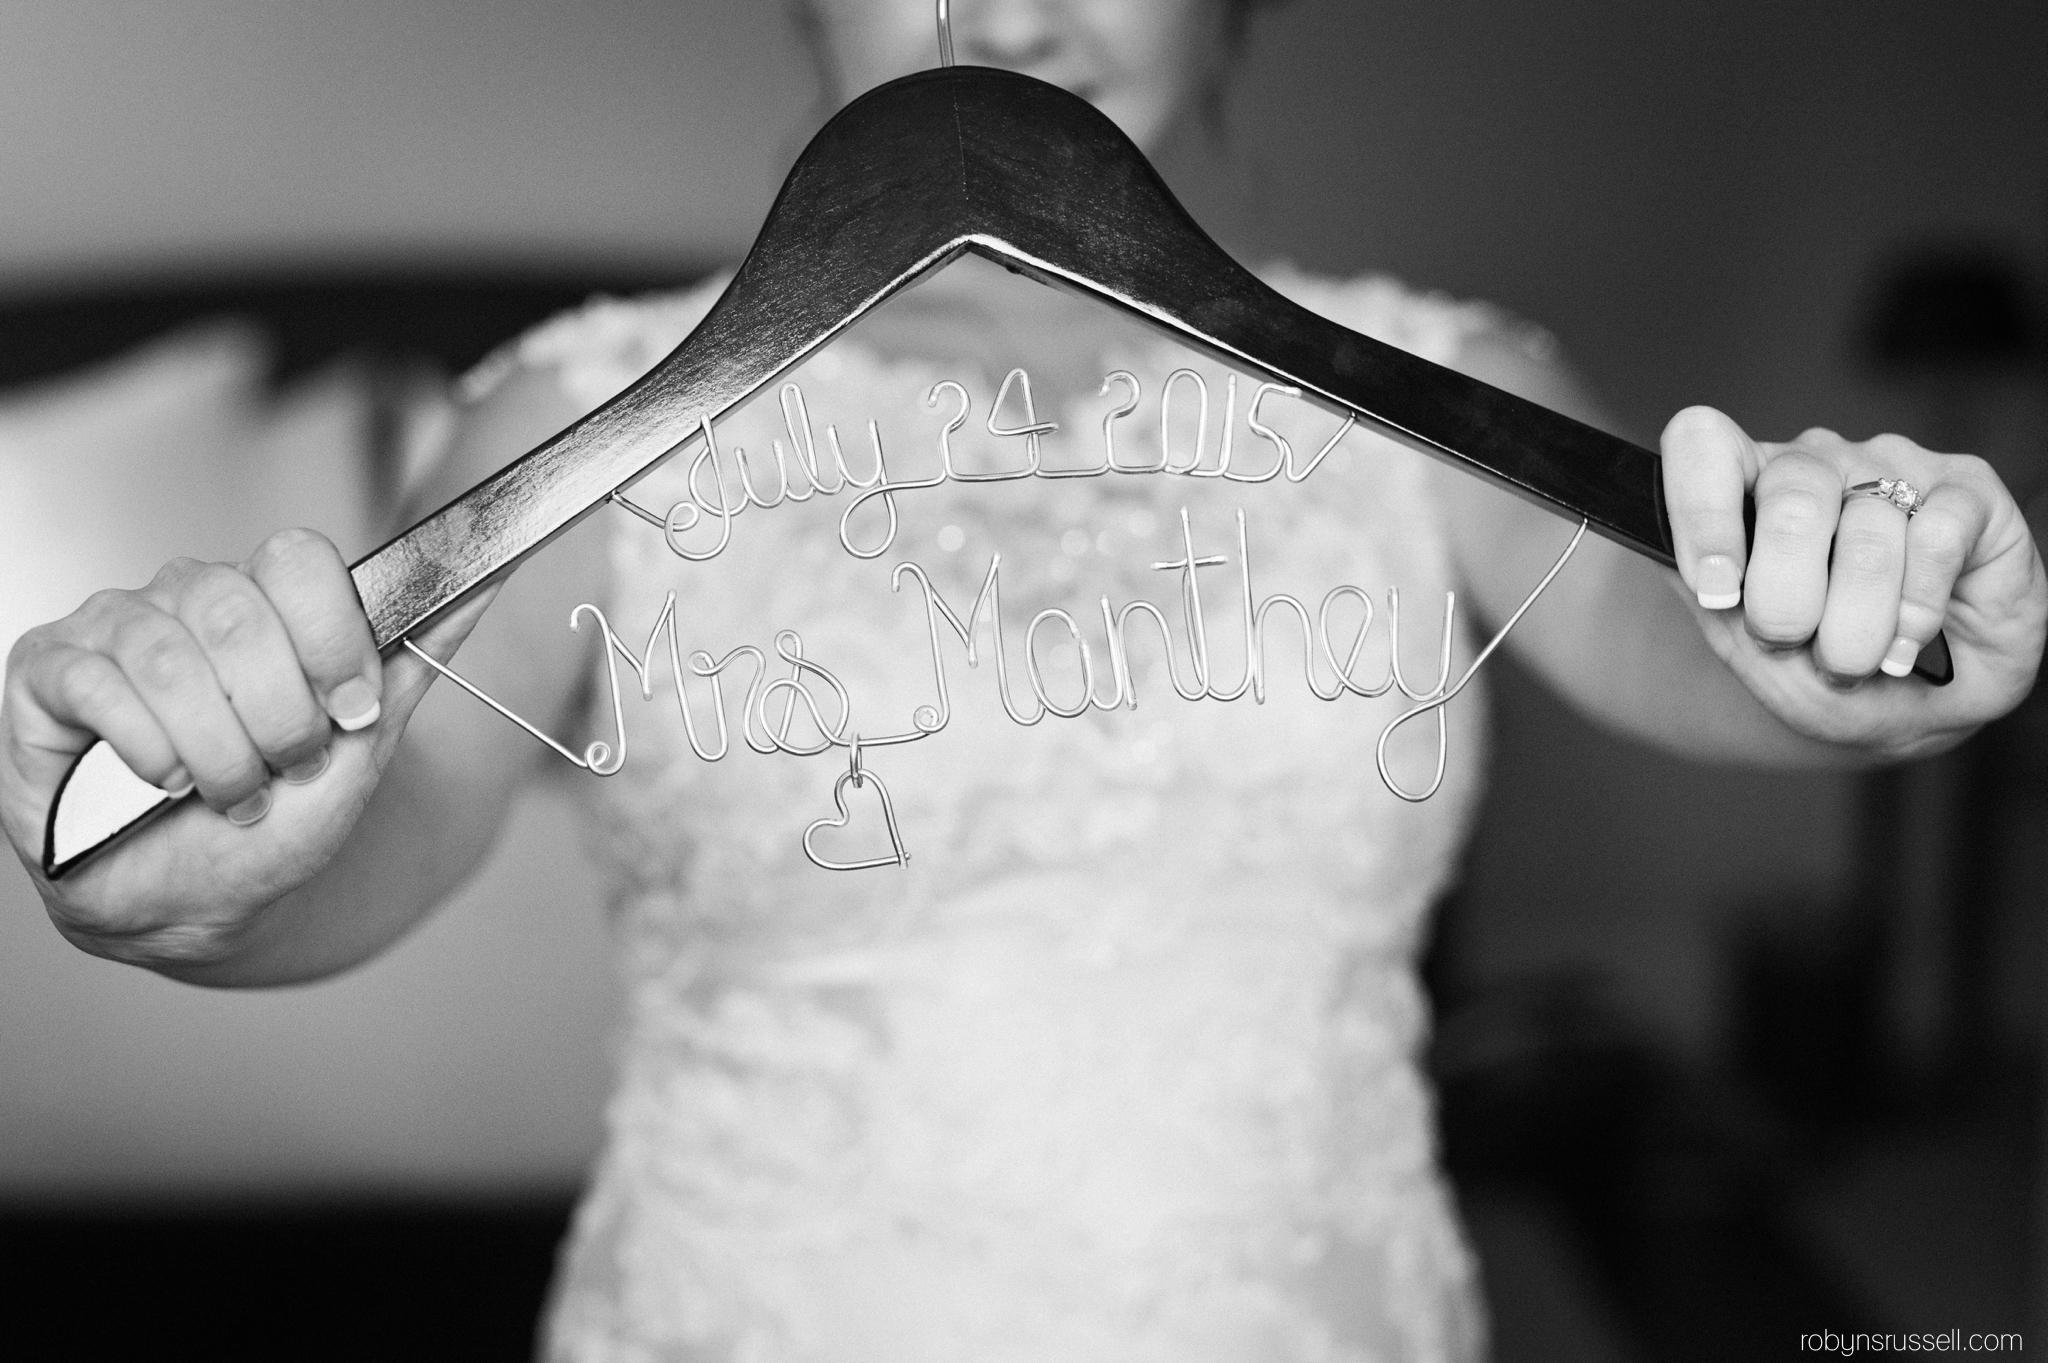 18-bridal-gown-hanger-mrs-manthey.jpg